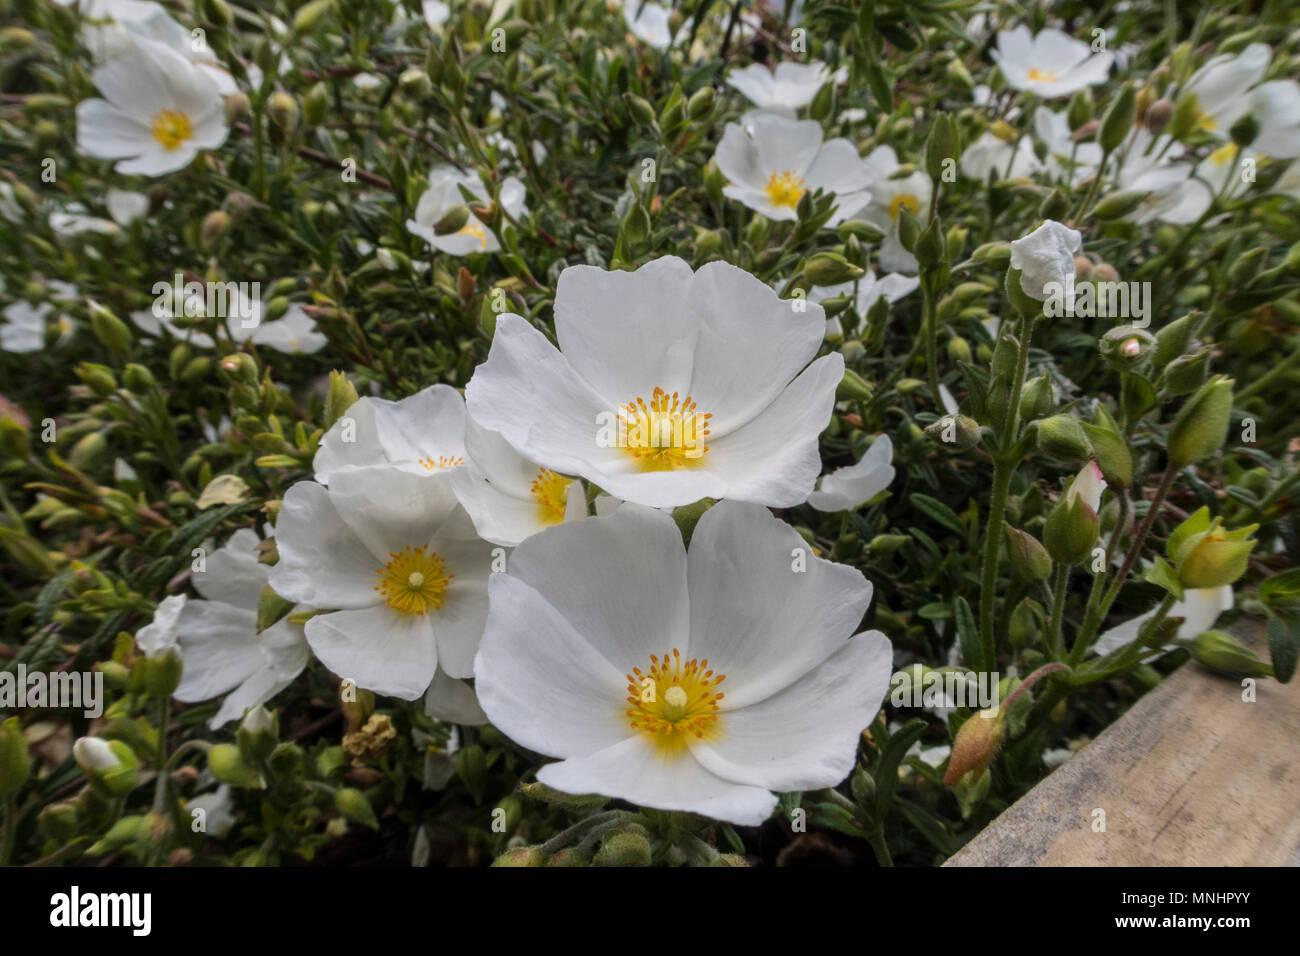 Sahuc Rock Rose, halimiocistus sahucii, grown as ground cover in a Devon garden. - Stock Image